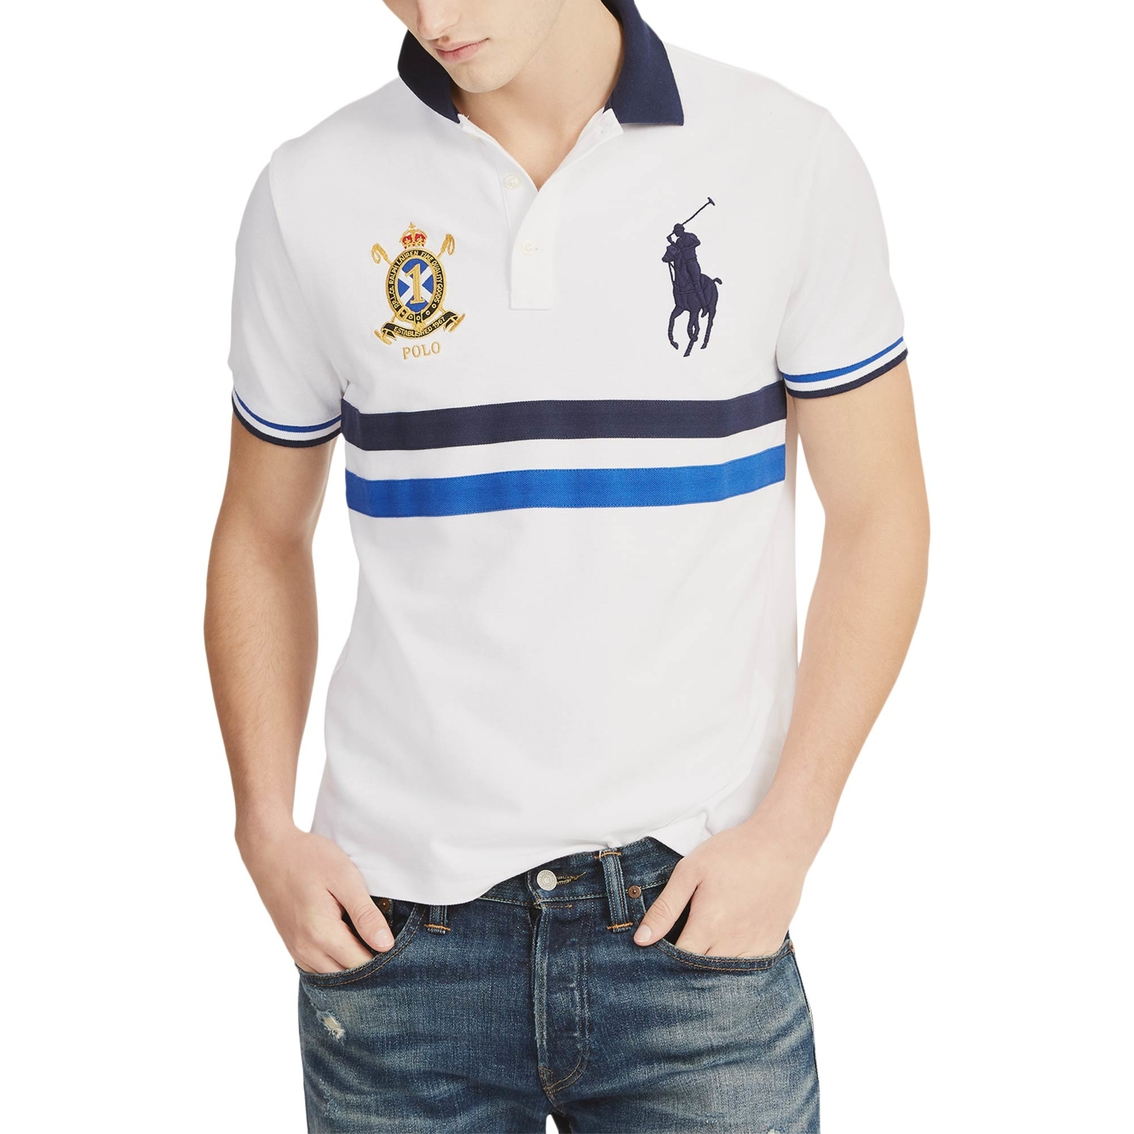 36c1e7bf3b7e Polo Ralph Lauren Classic Fit Mesh Polo Shirt   Polos   Apparel ...